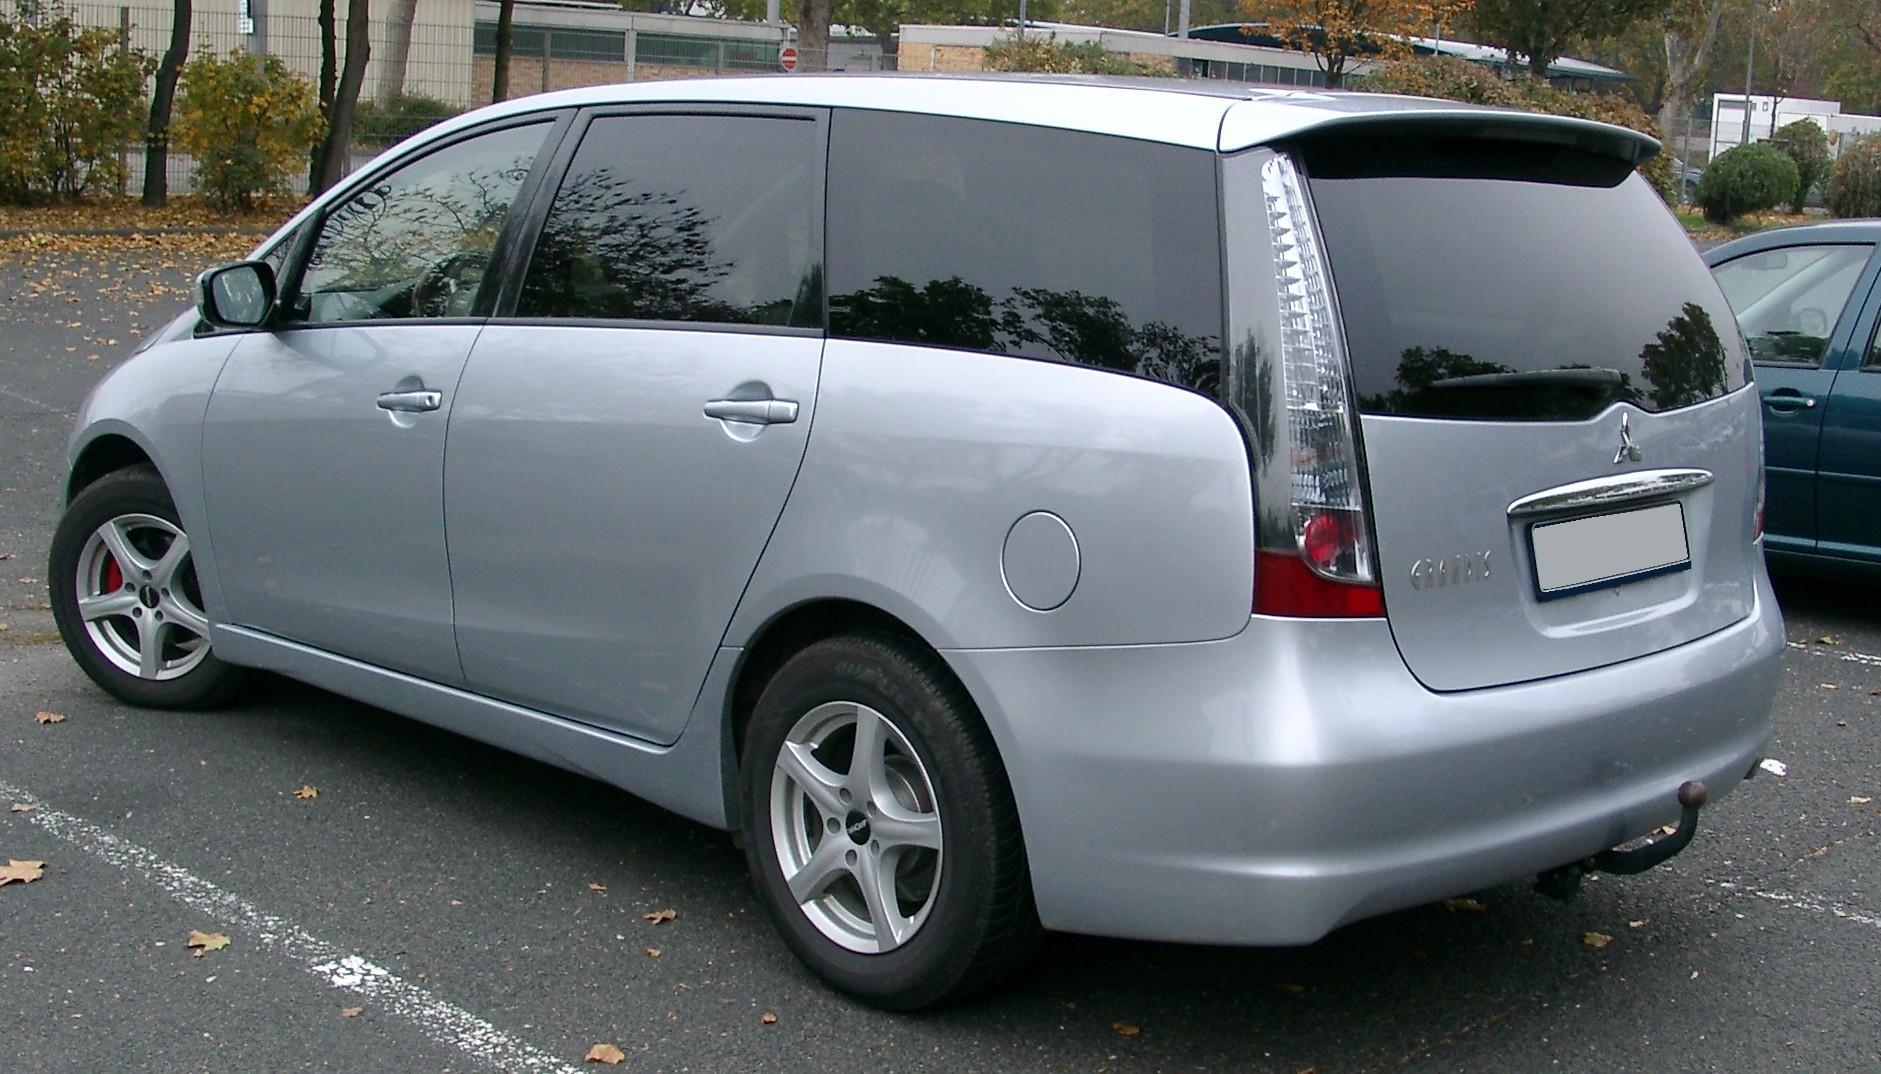 Mitsubishi_Grandis_rear_20071102.jpg